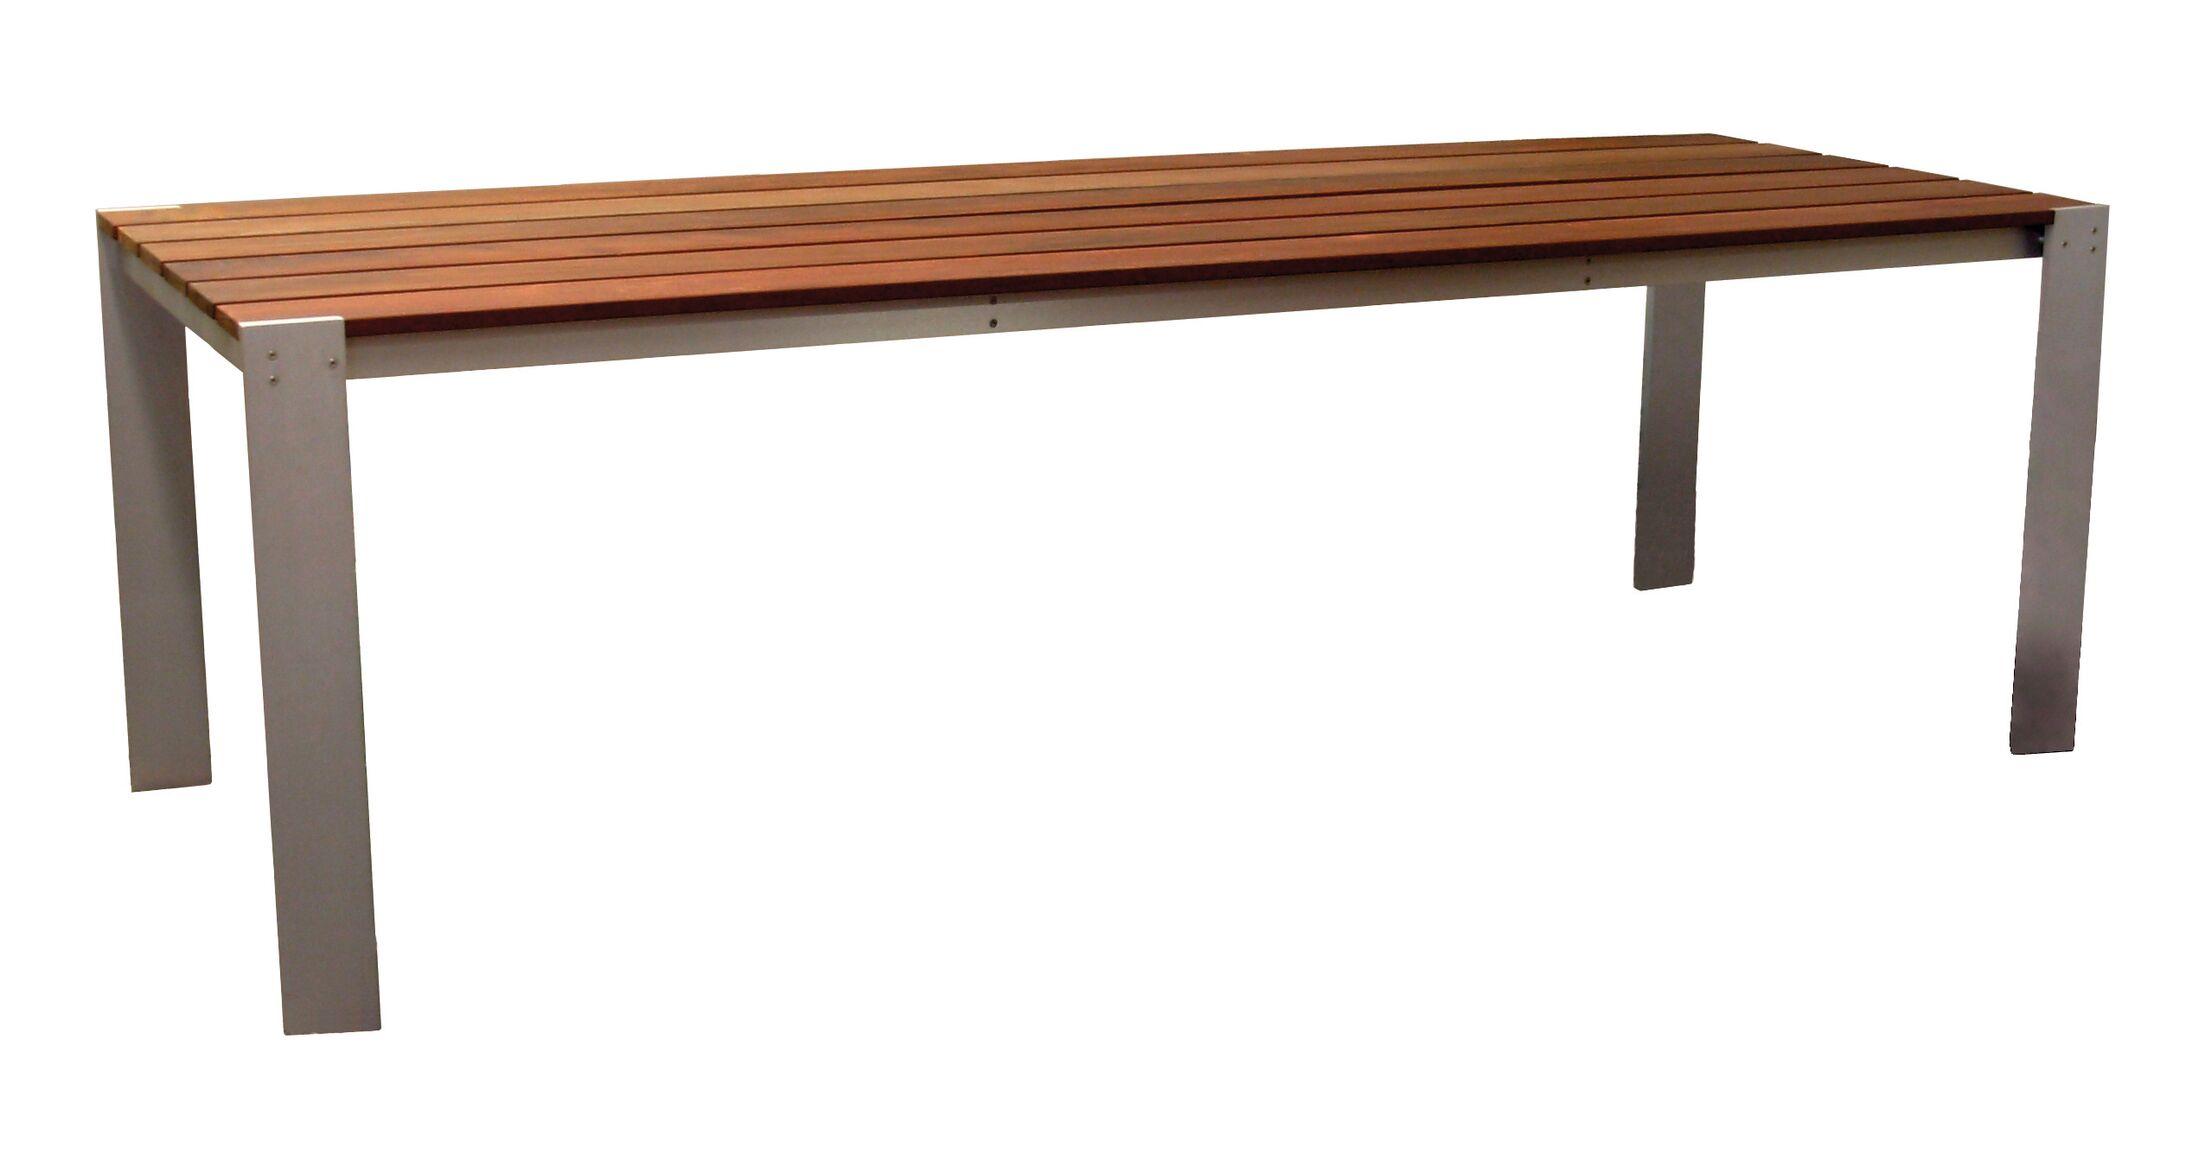 Luma Aluminum Dining Table Table Size: 34